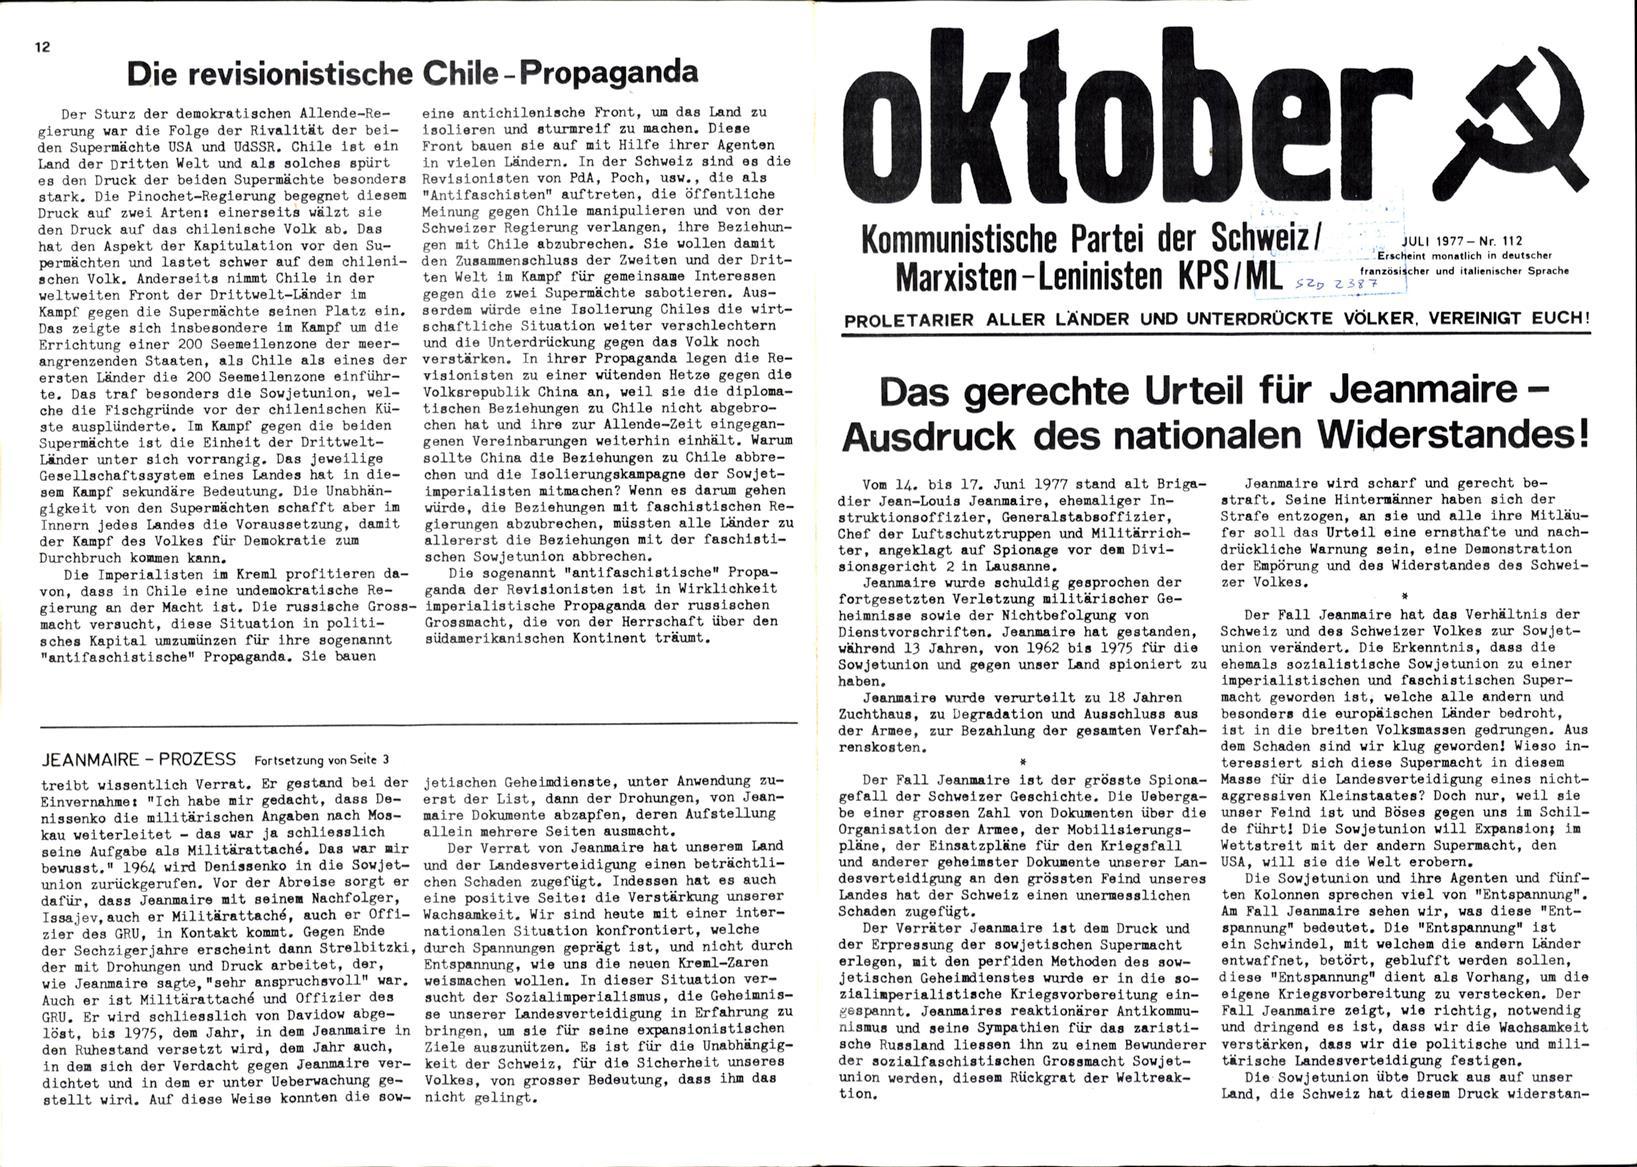 Schweiz_KPSML_Oktober_19770700_112_001